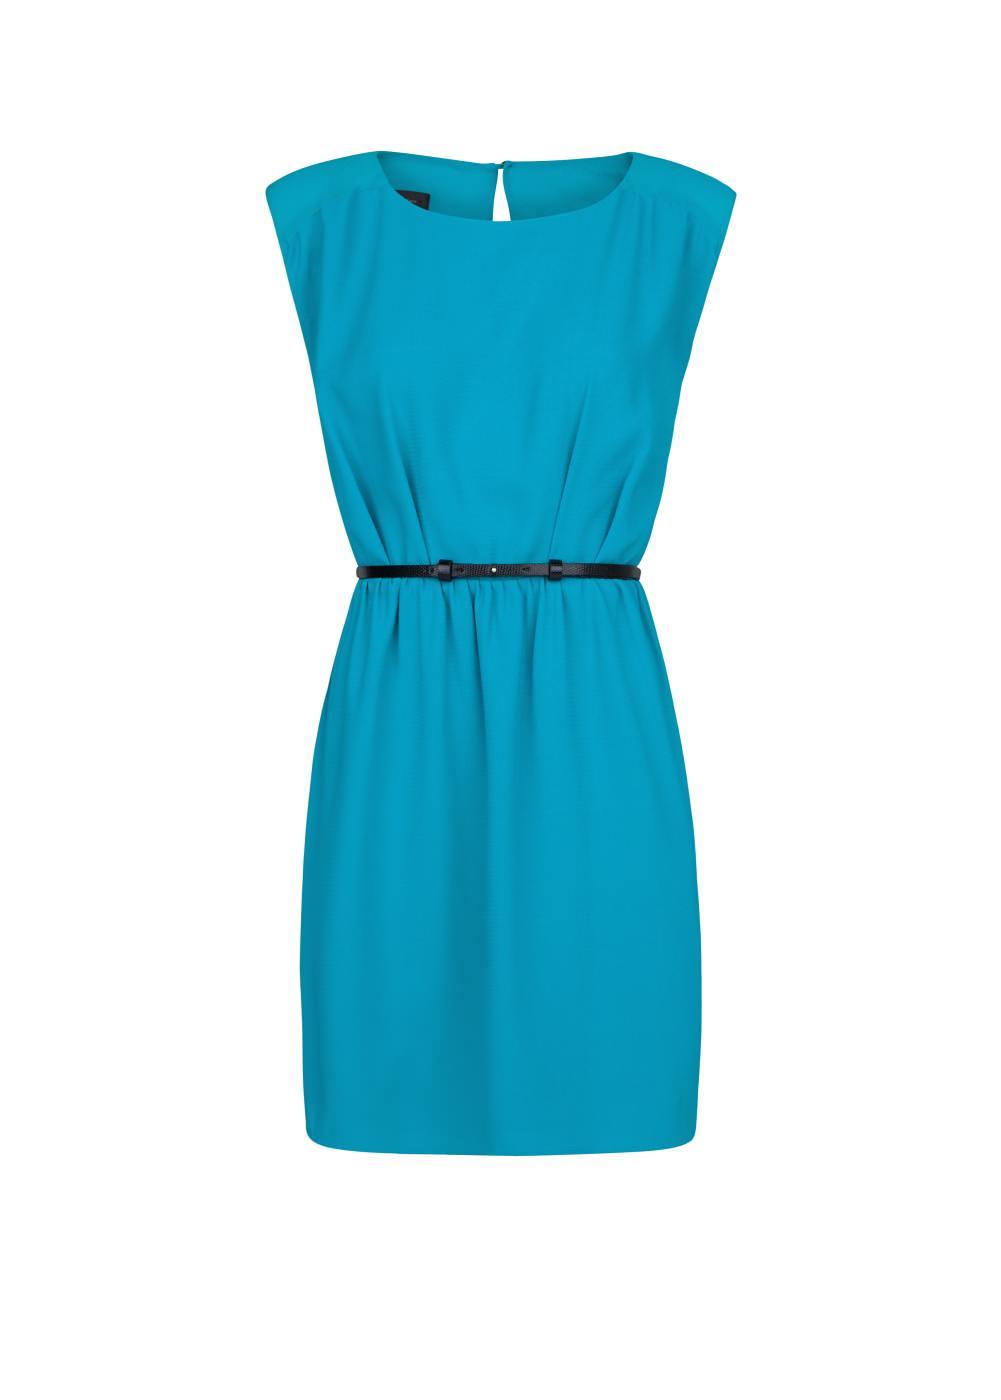 rebajas mango vestidos blusas verano 2014